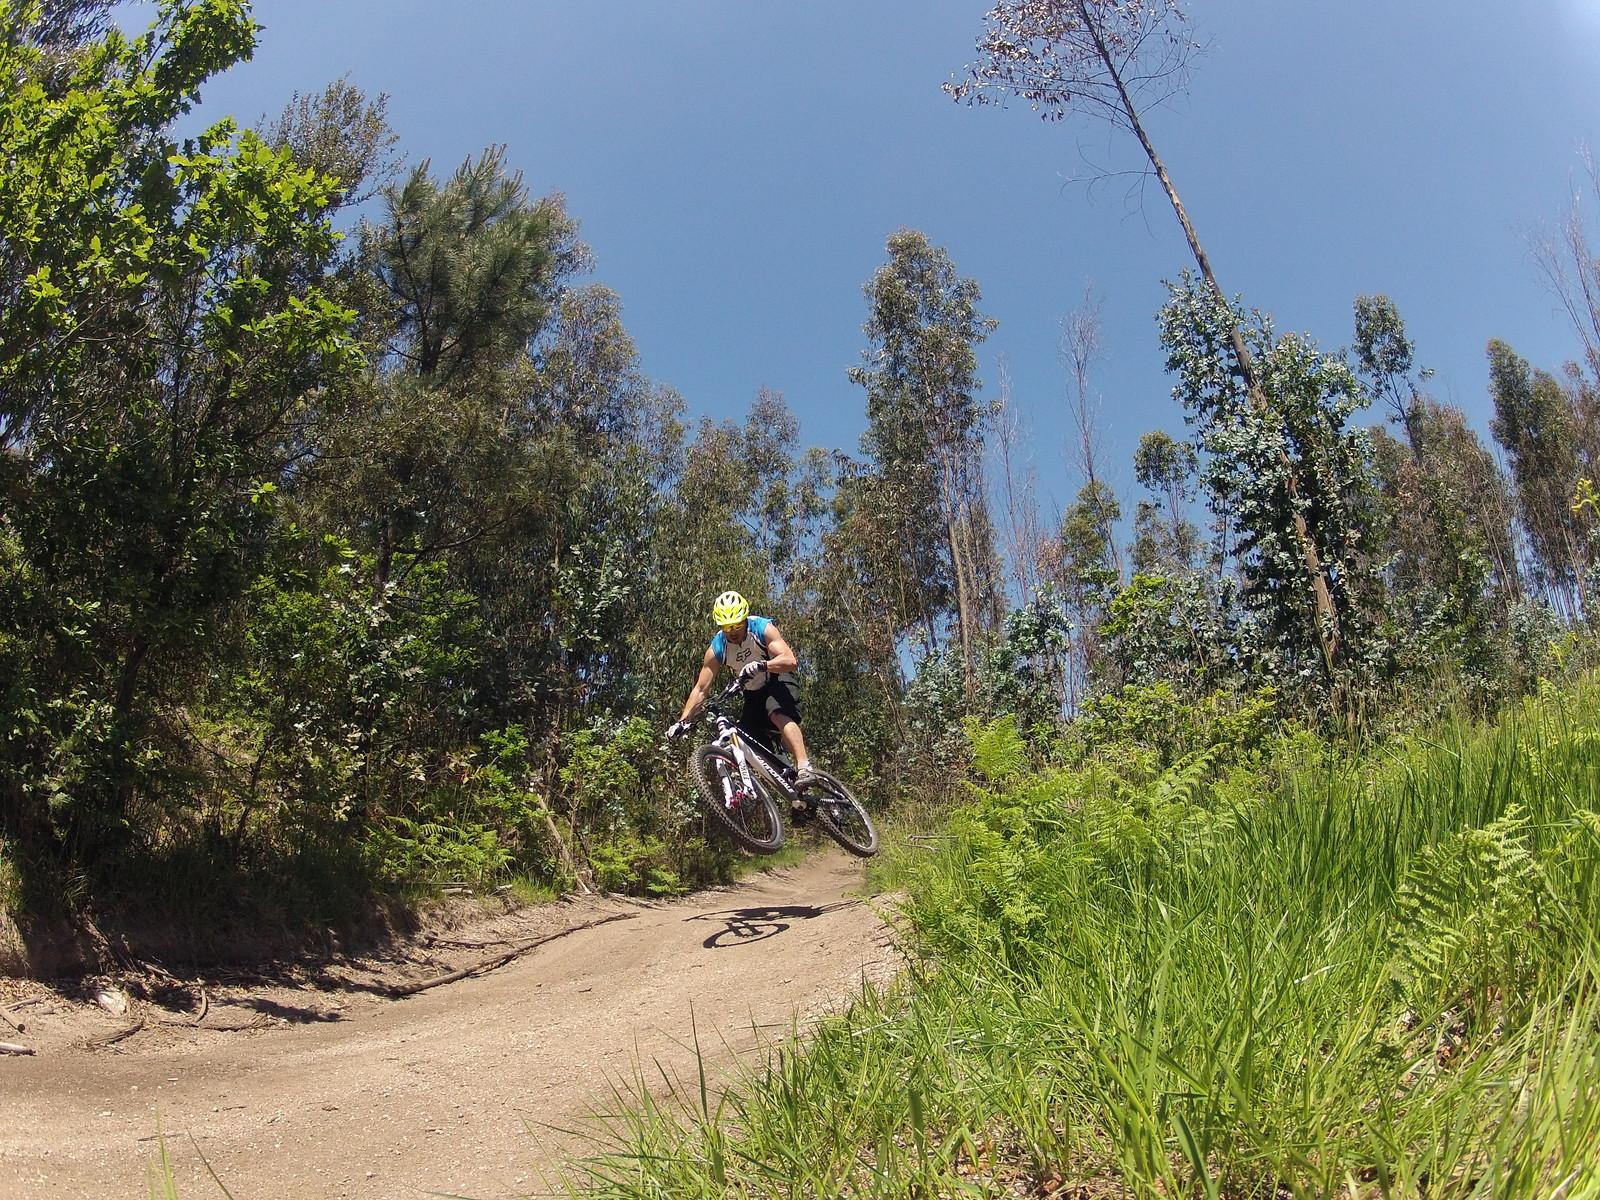 GOPR0888 - David_Braga - Mountain Biking Pictures - Vital MTB